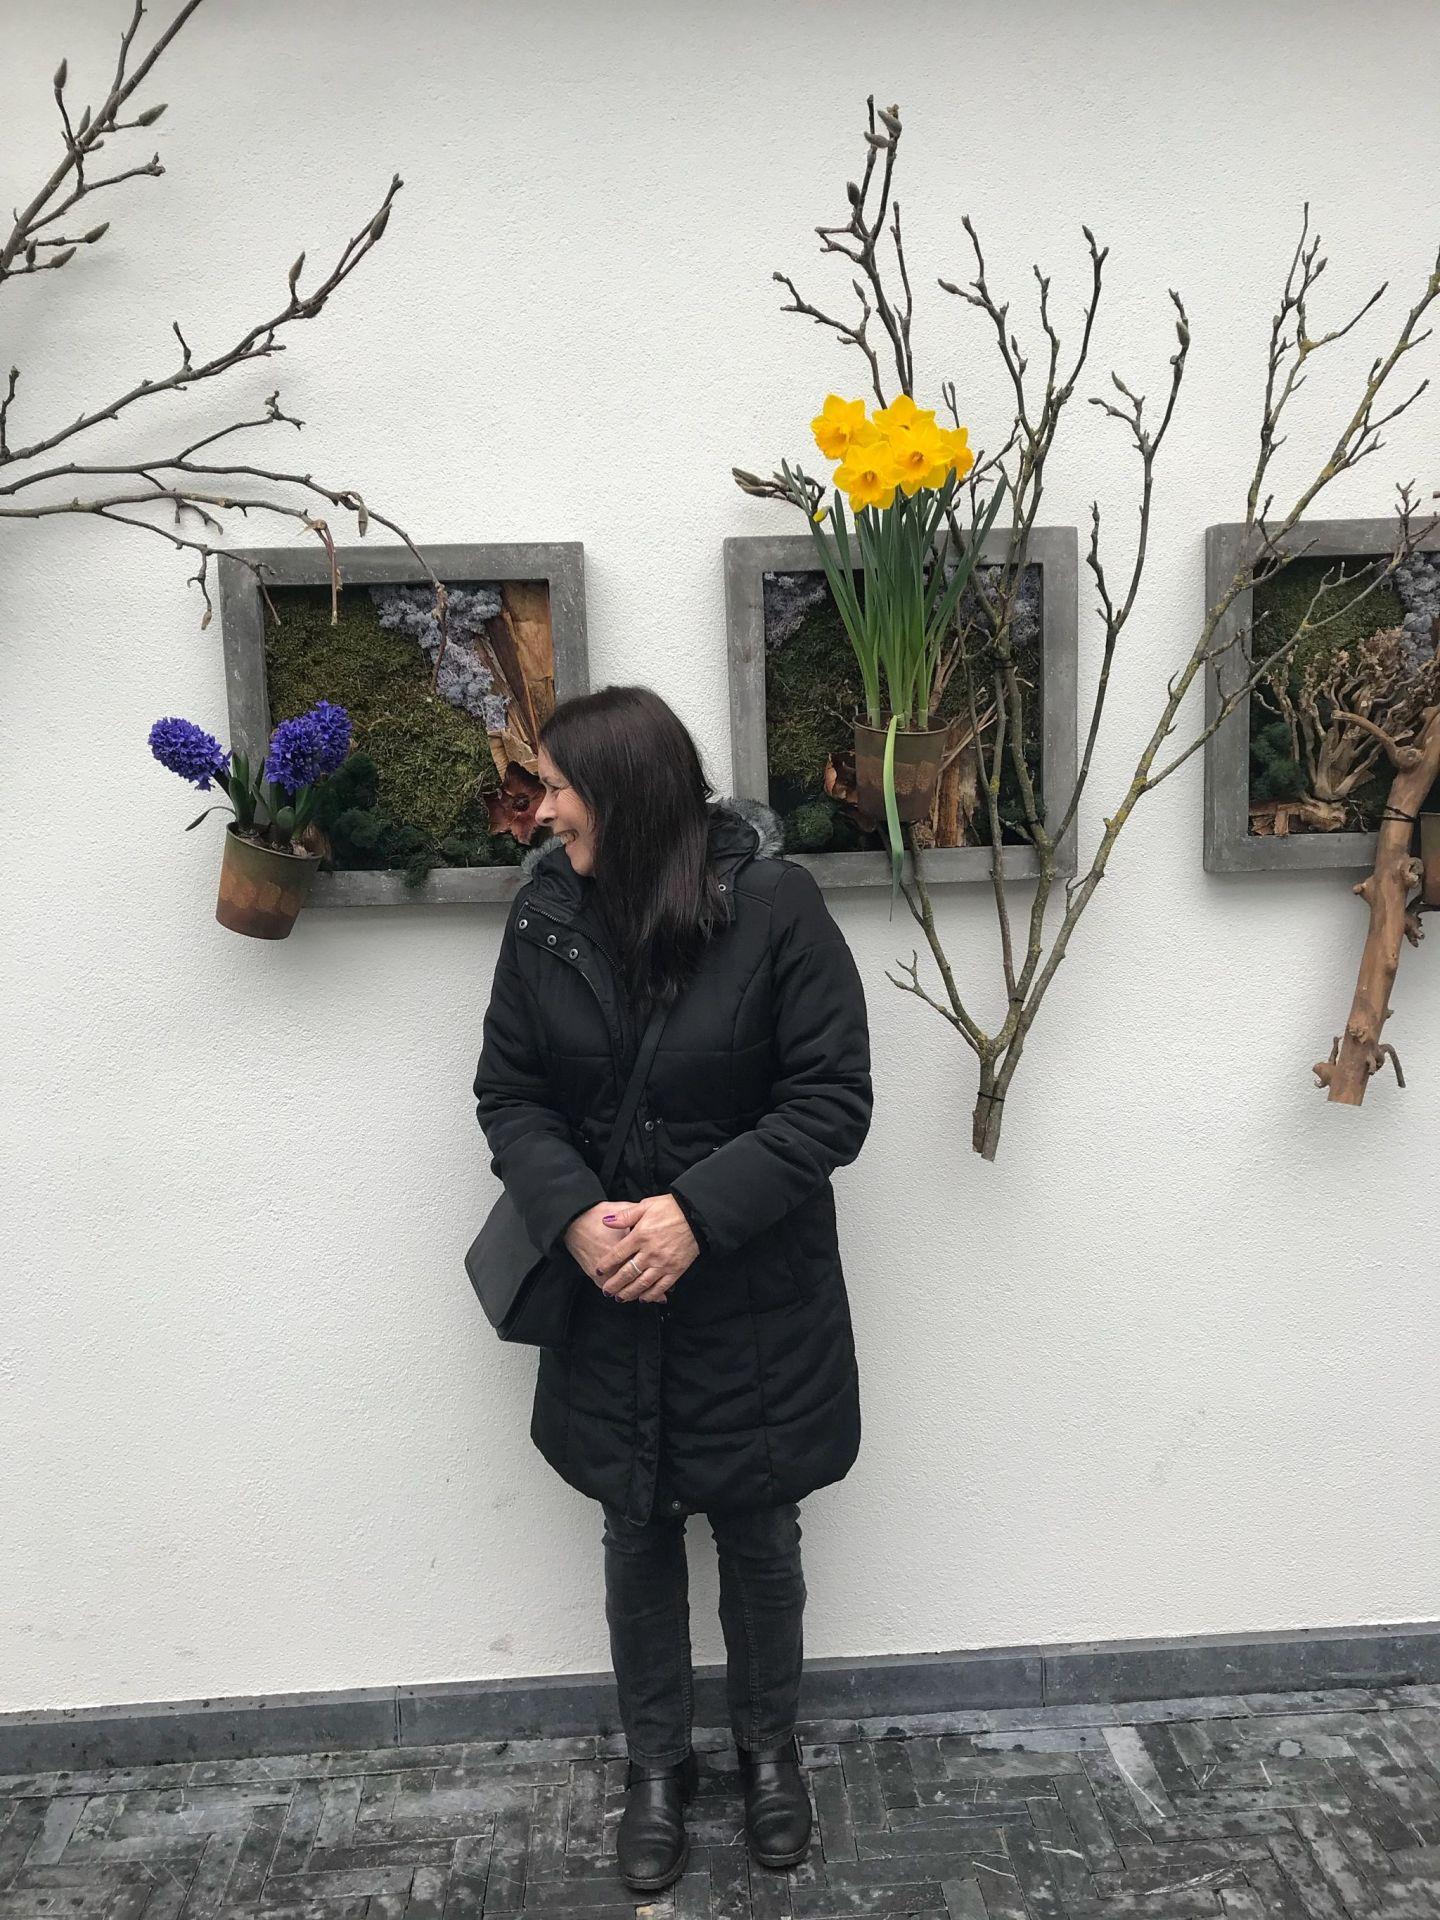 Home decor inspo at Keukenhof Tulip Gardens